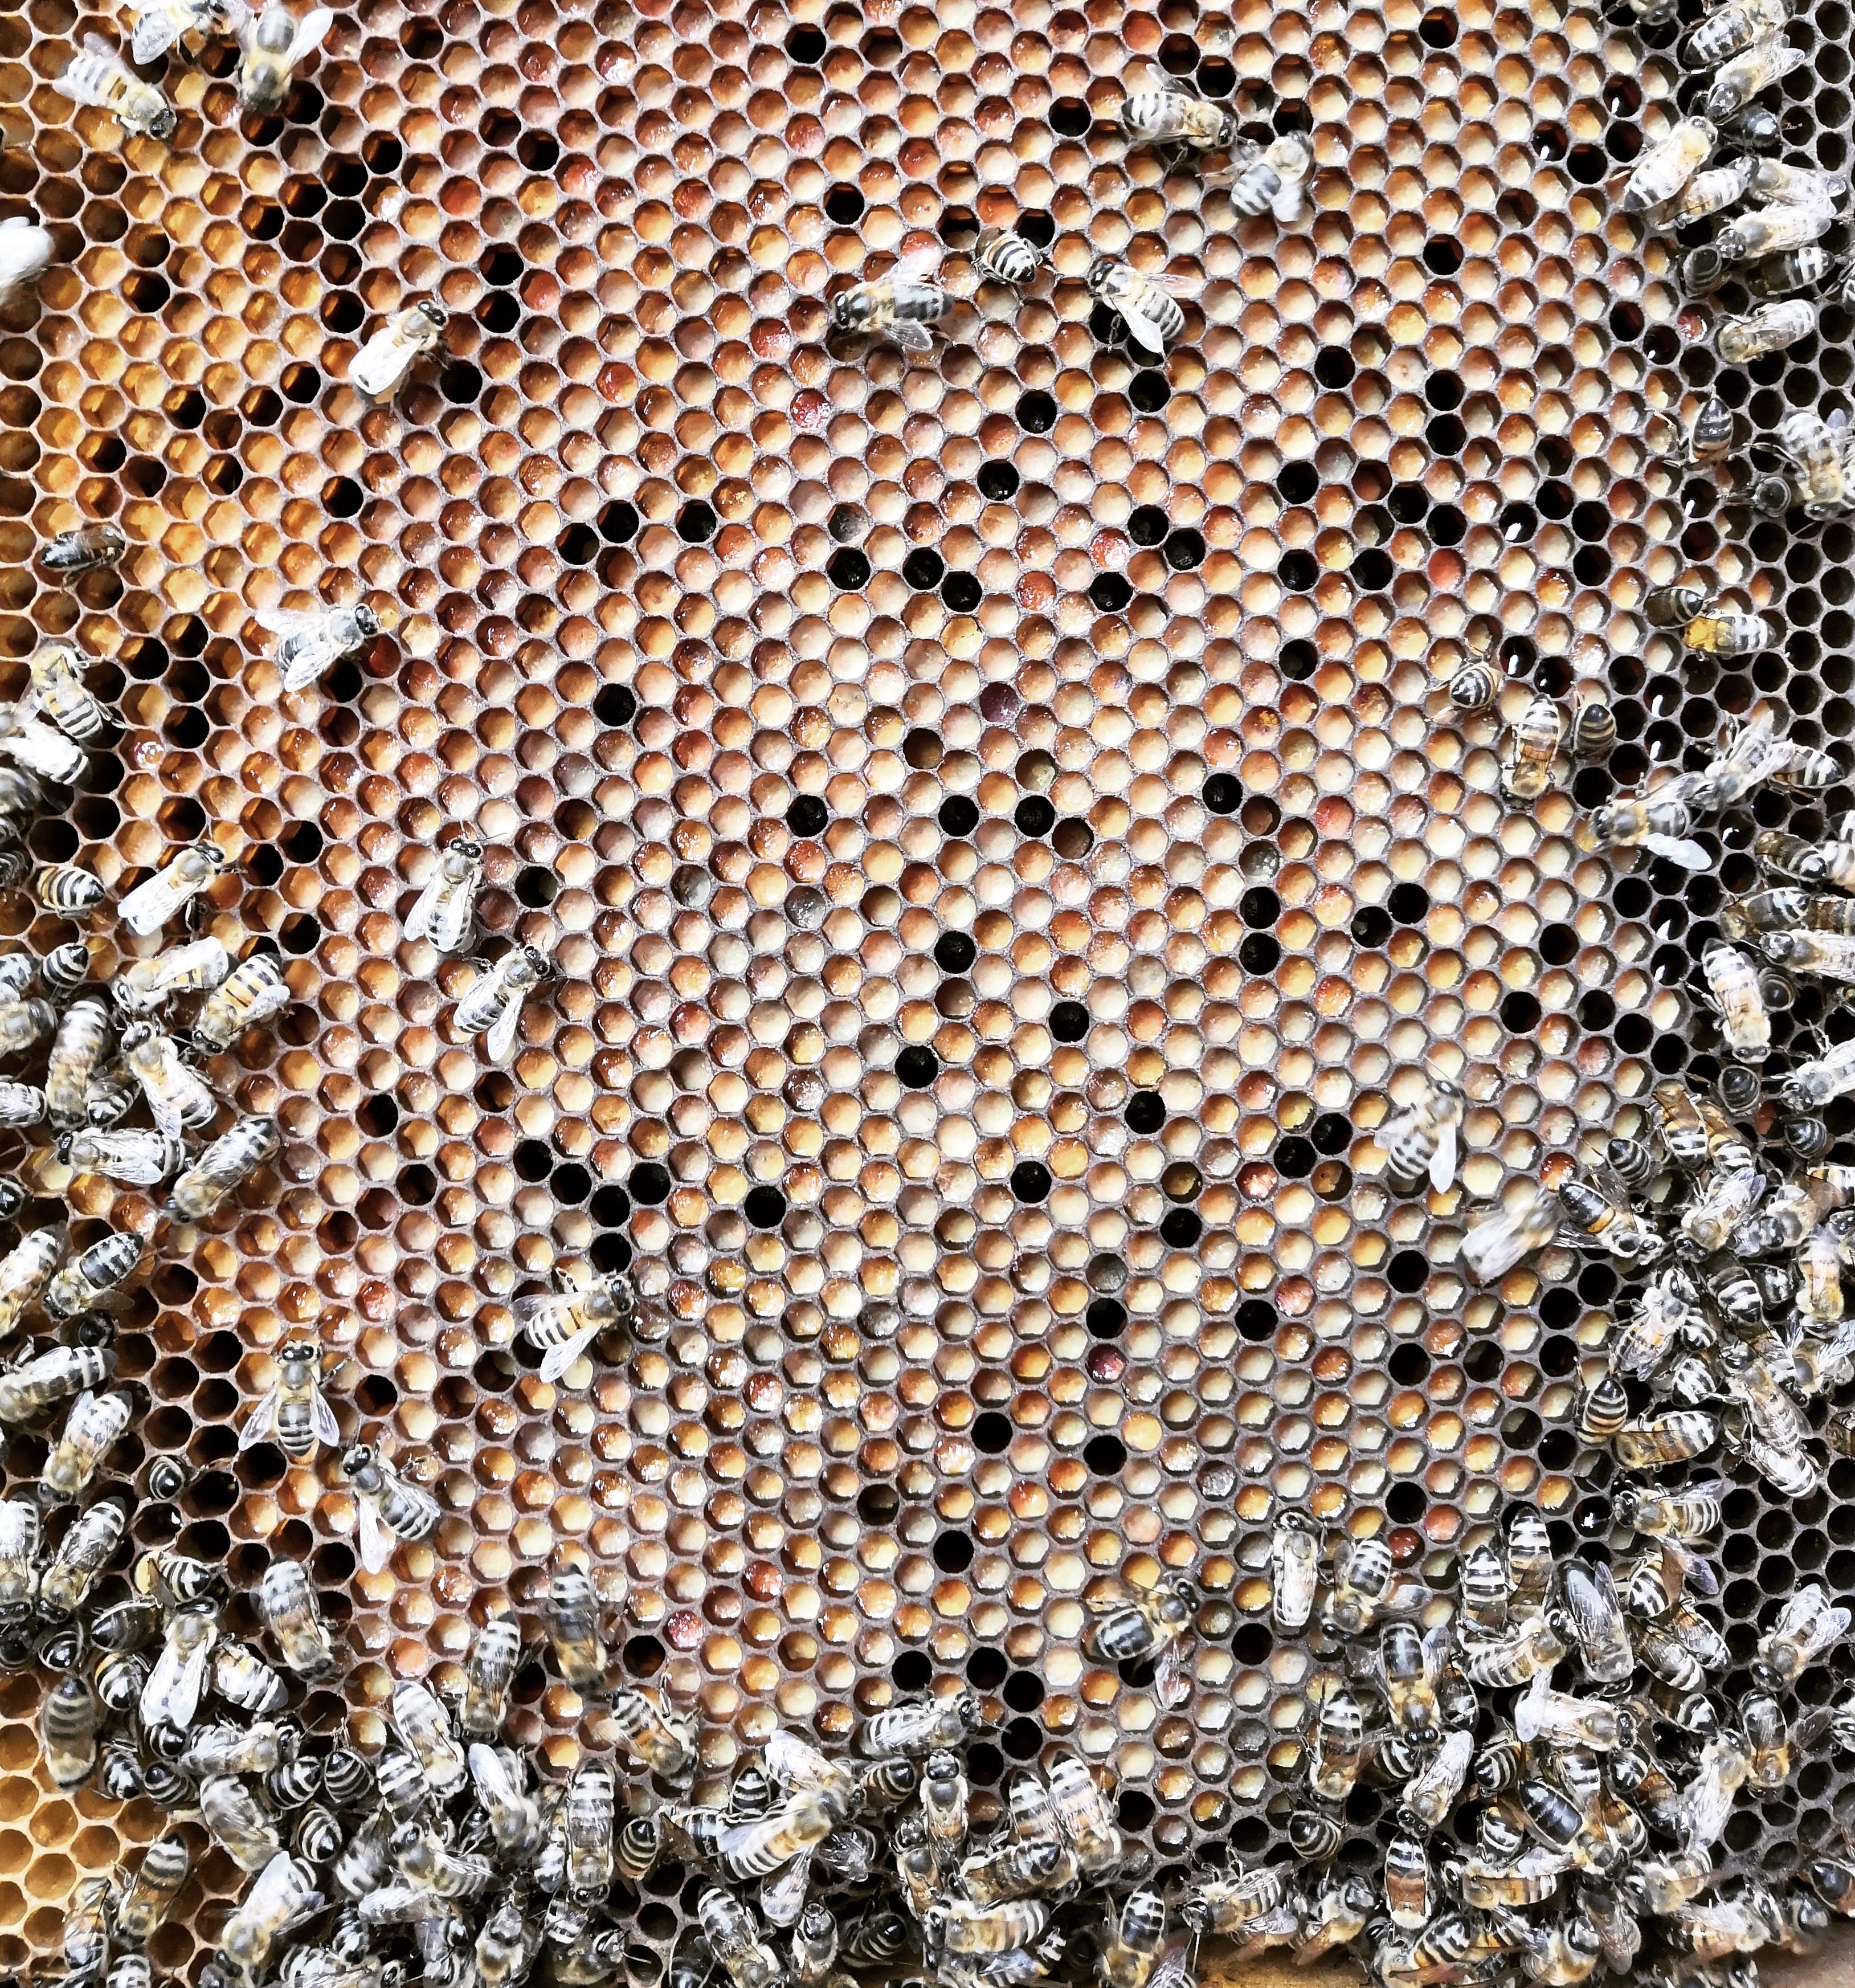 cadre de pollen